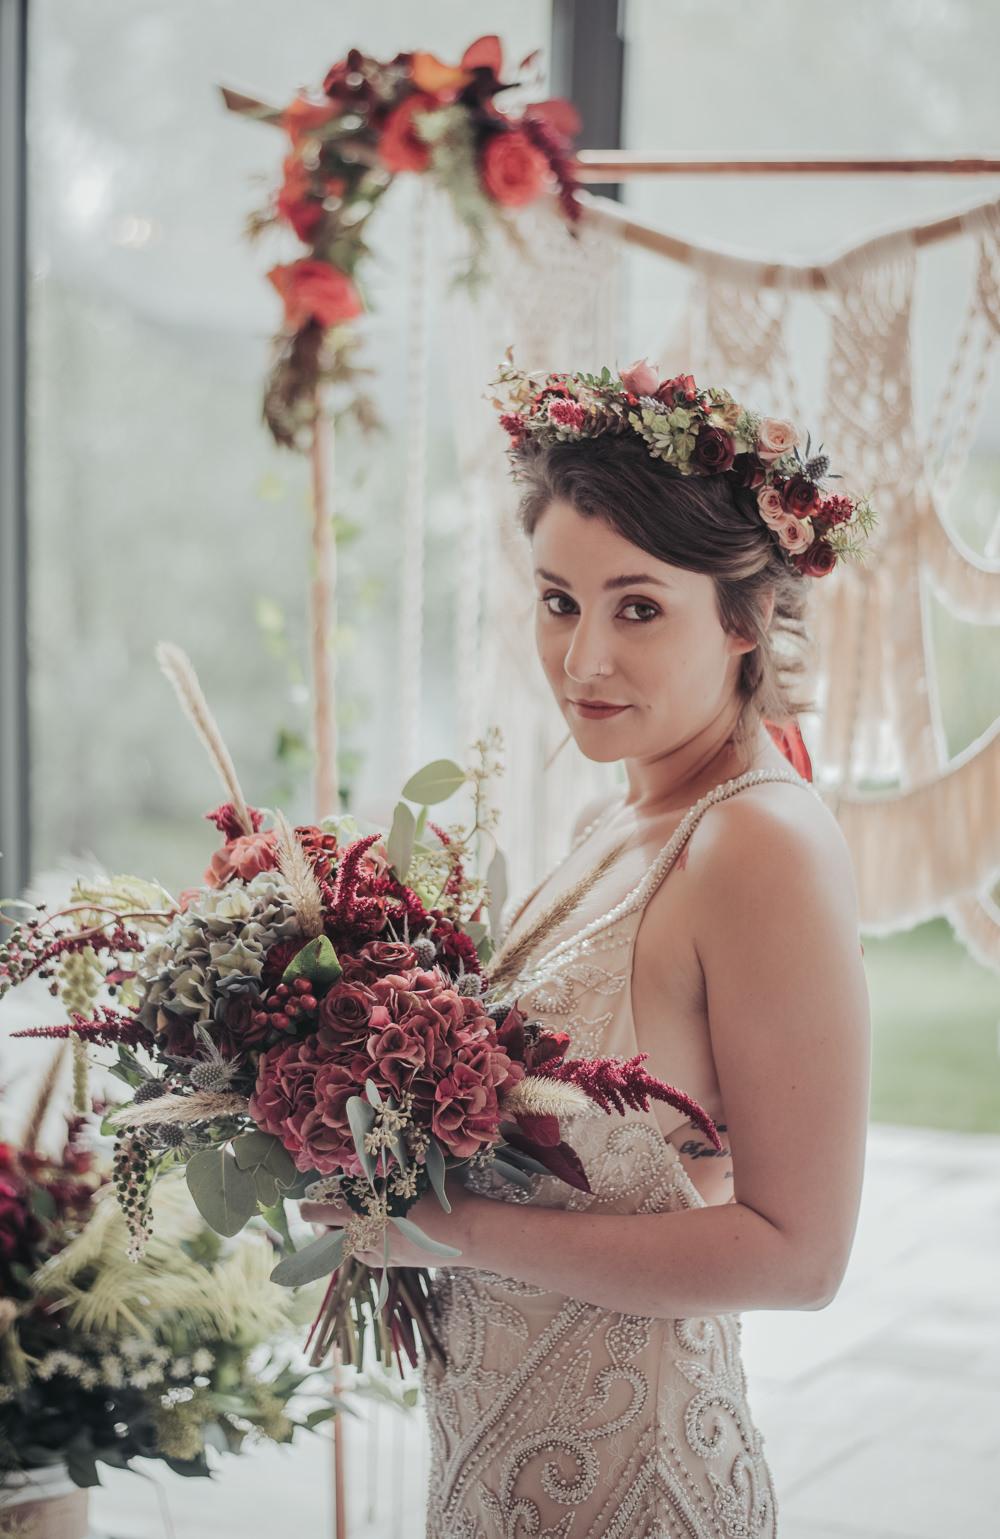 Bride Bridal Flower Crown Eco Friendly Wedding Inspiration Sarah Jayne Photography